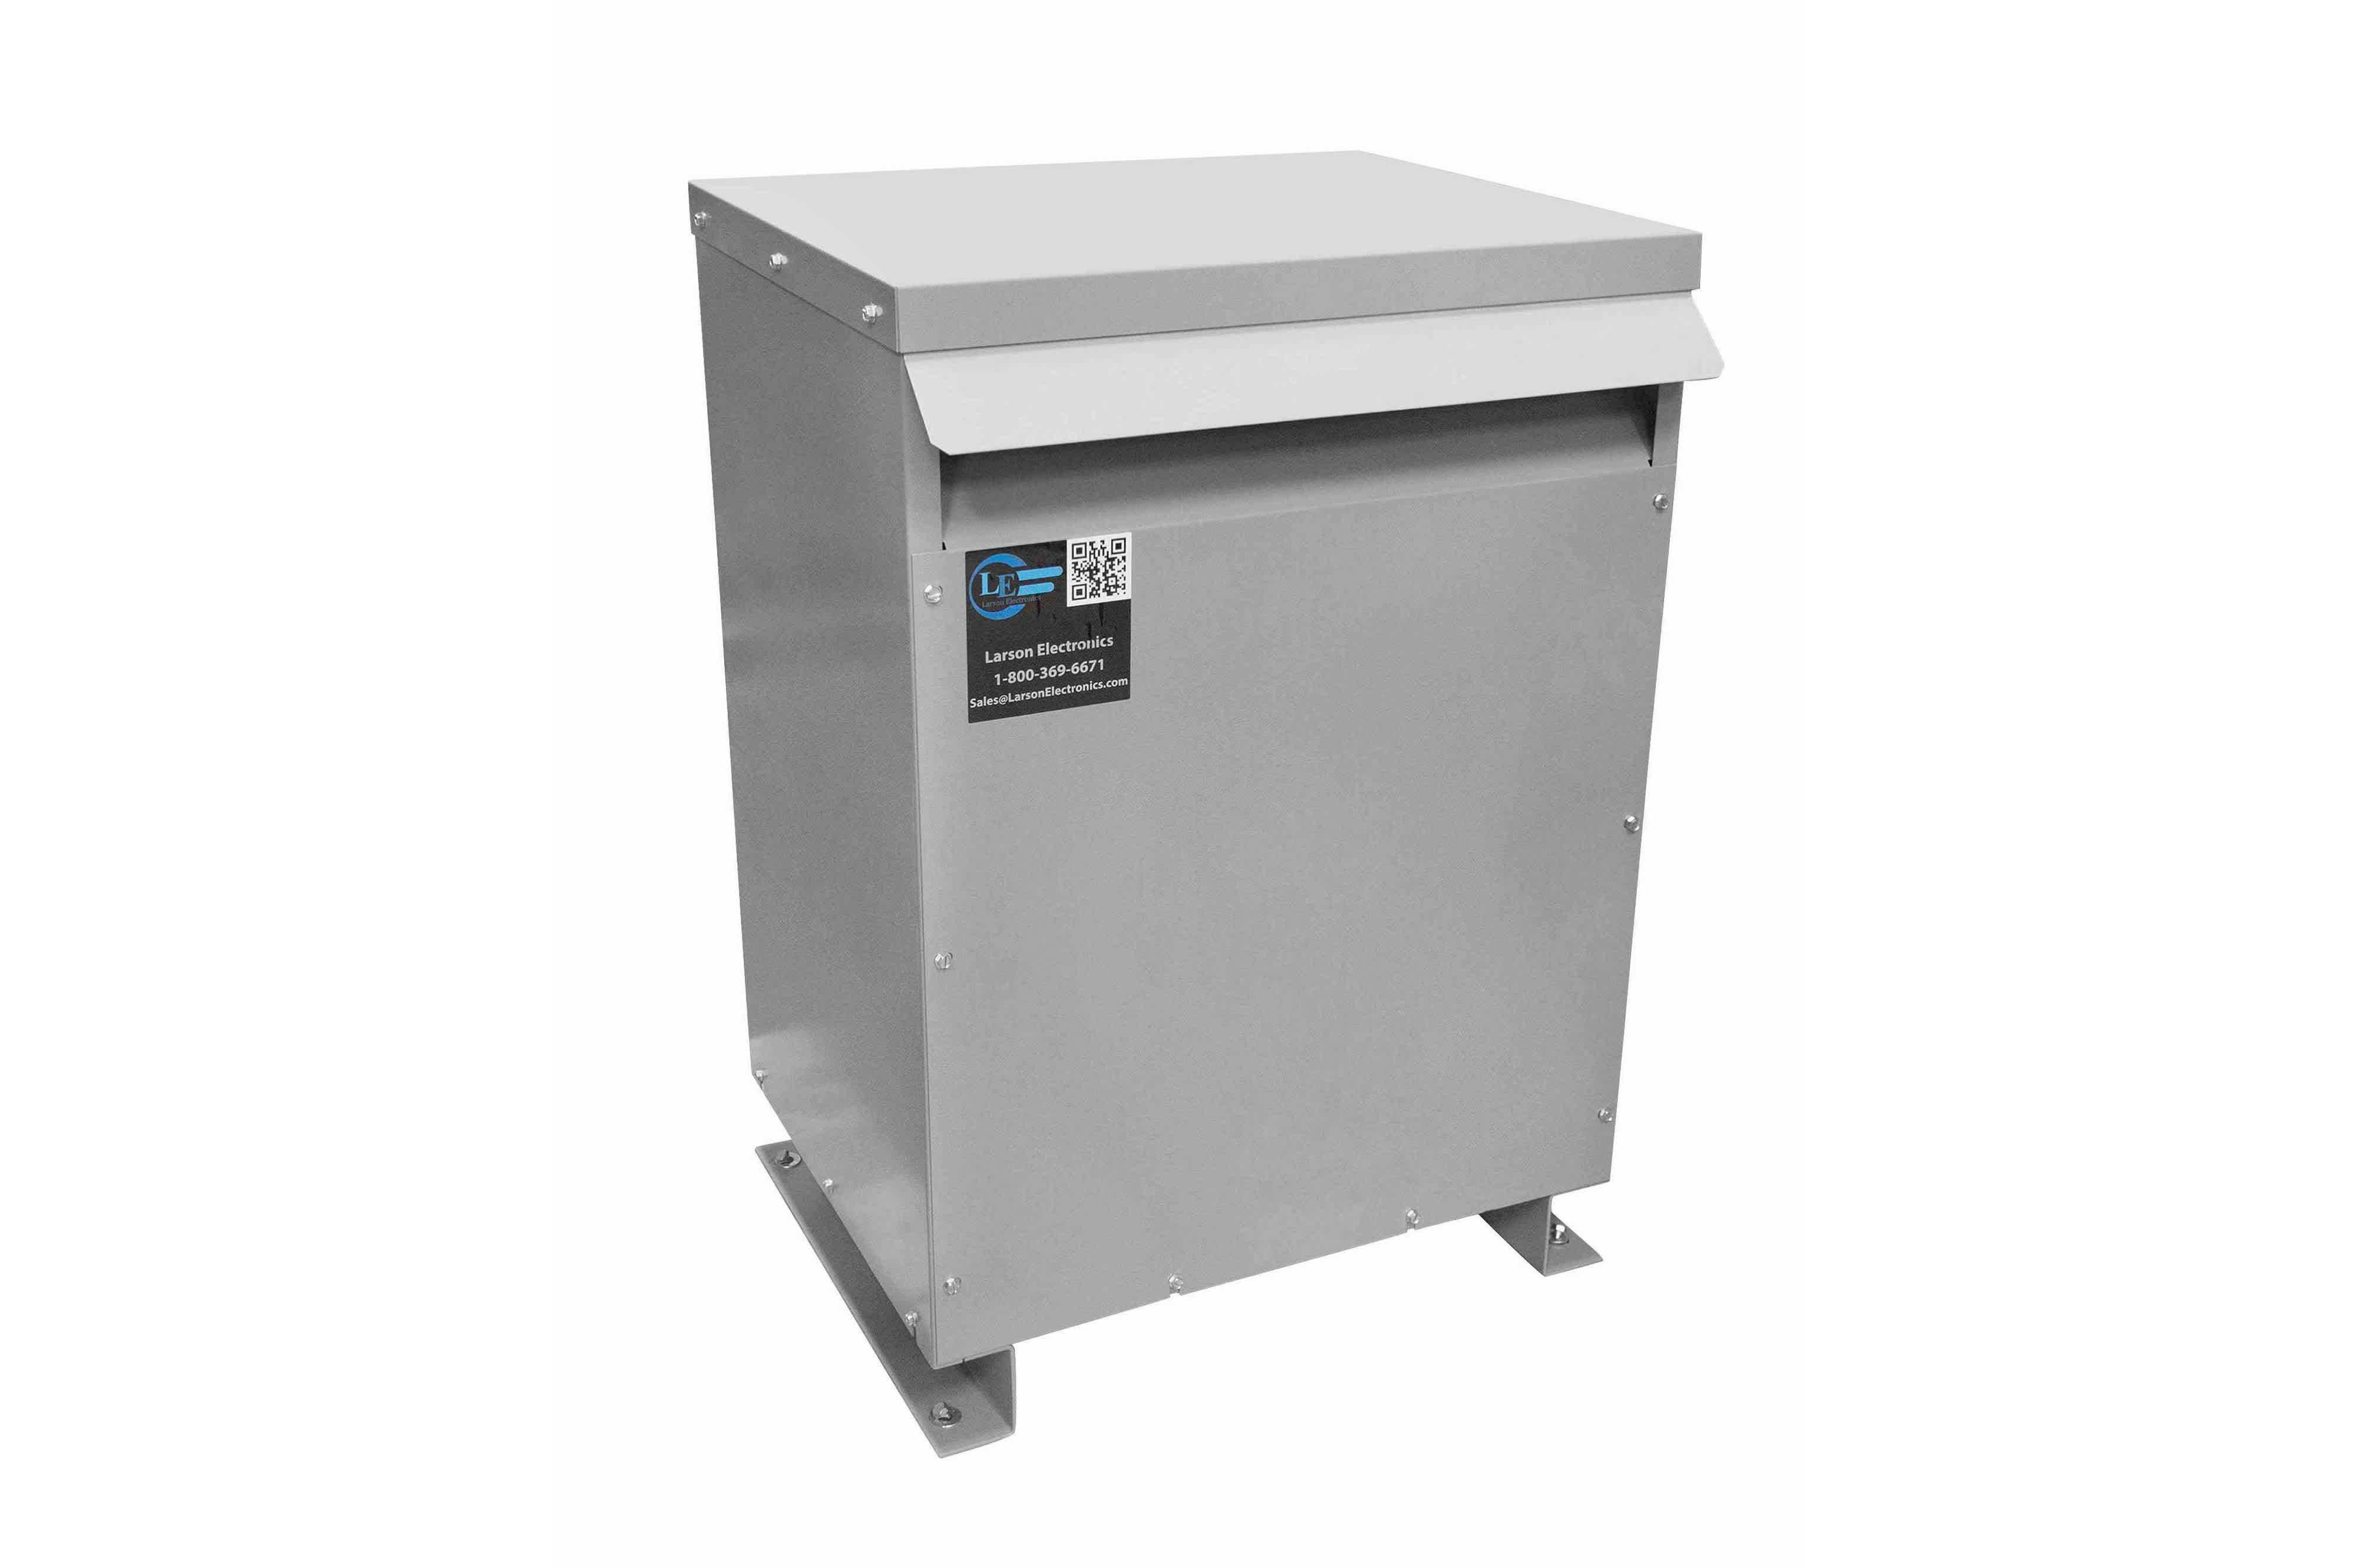 250 kVA 3PH Isolation Transformer, 575V Wye Primary, 240V/120 Delta Secondary, N3R, Ventilated, 60 Hz